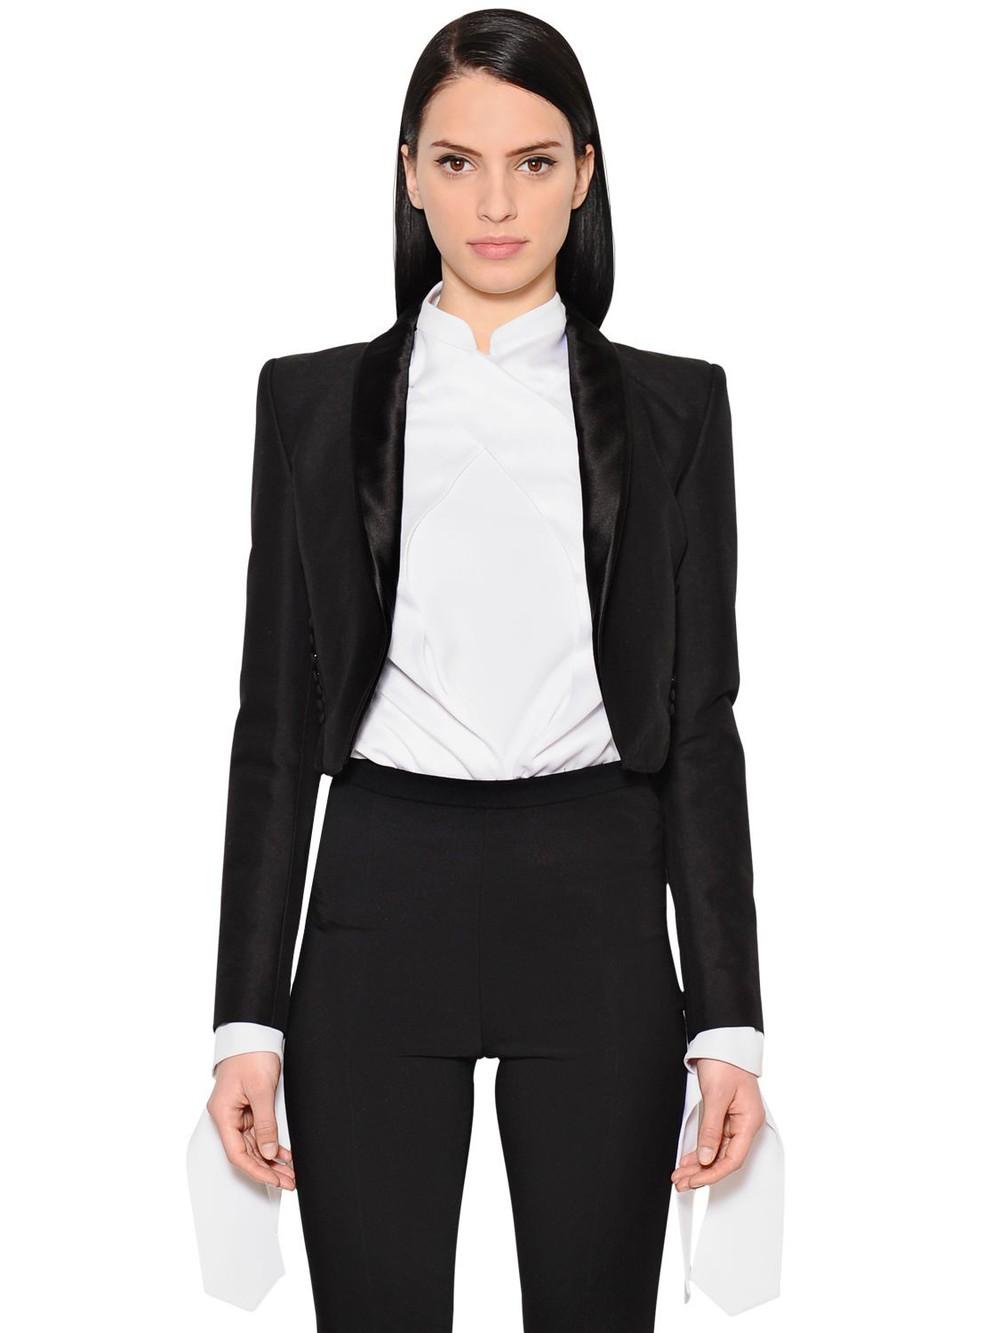 ANTONIO BERARDI Cropped Cotton & Wool Blend Jacket in black